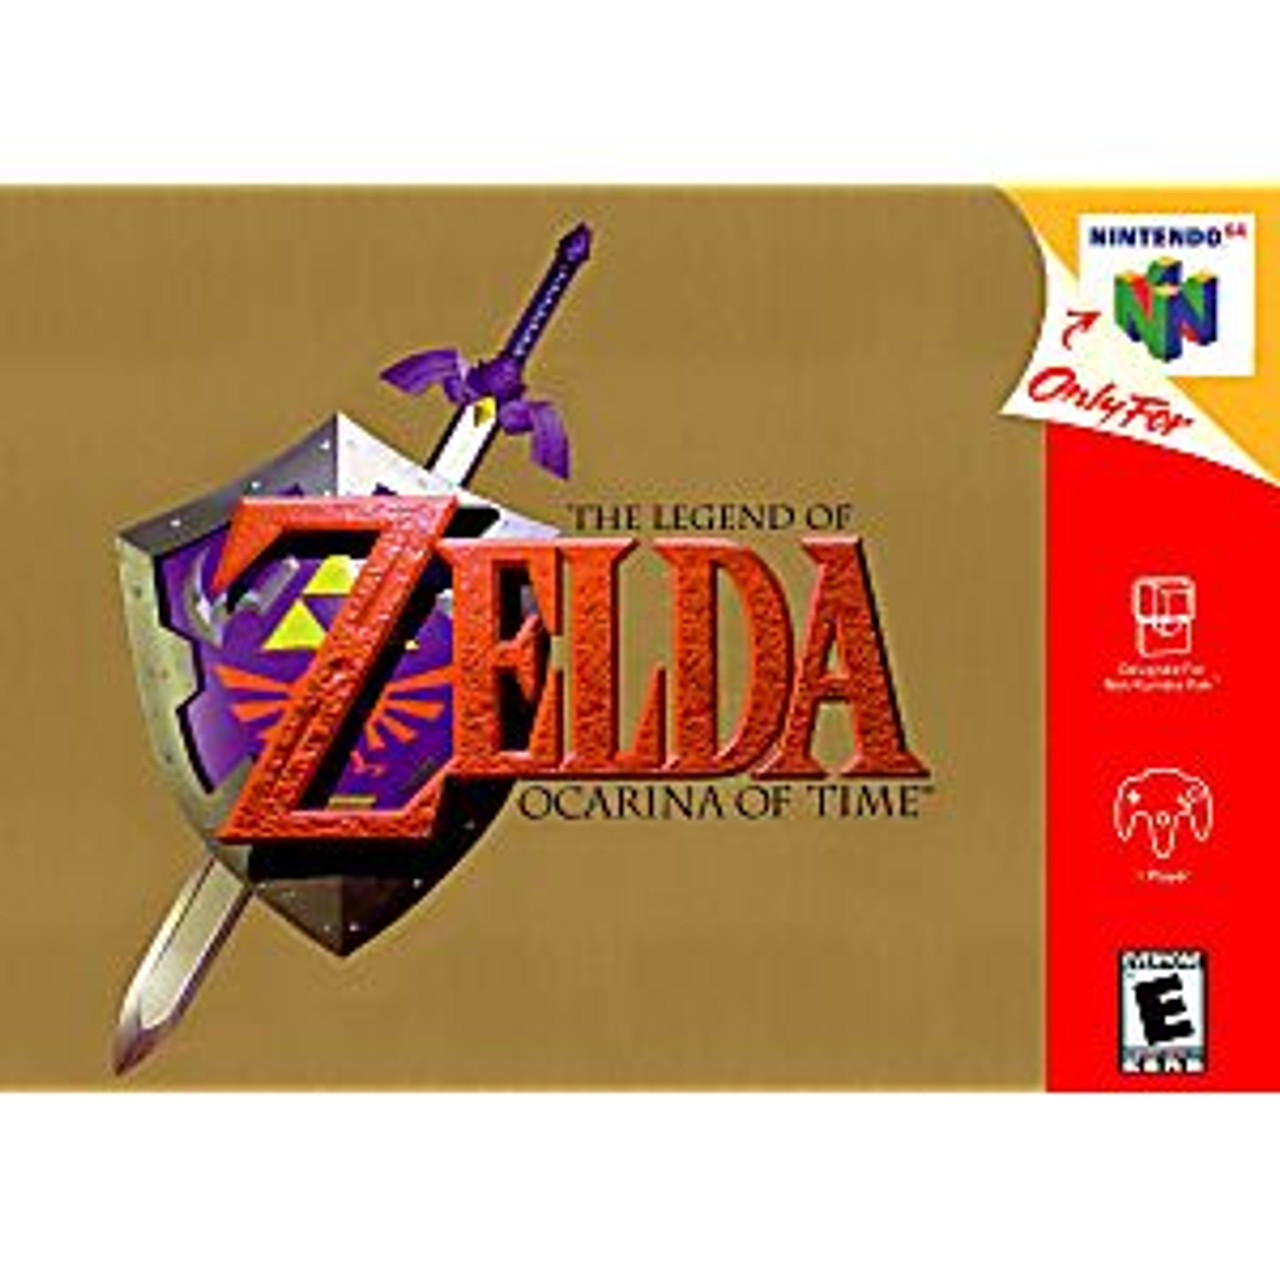 ZELDA OCARINA OF TIME GOLD COLLECTORS EDITION - N64